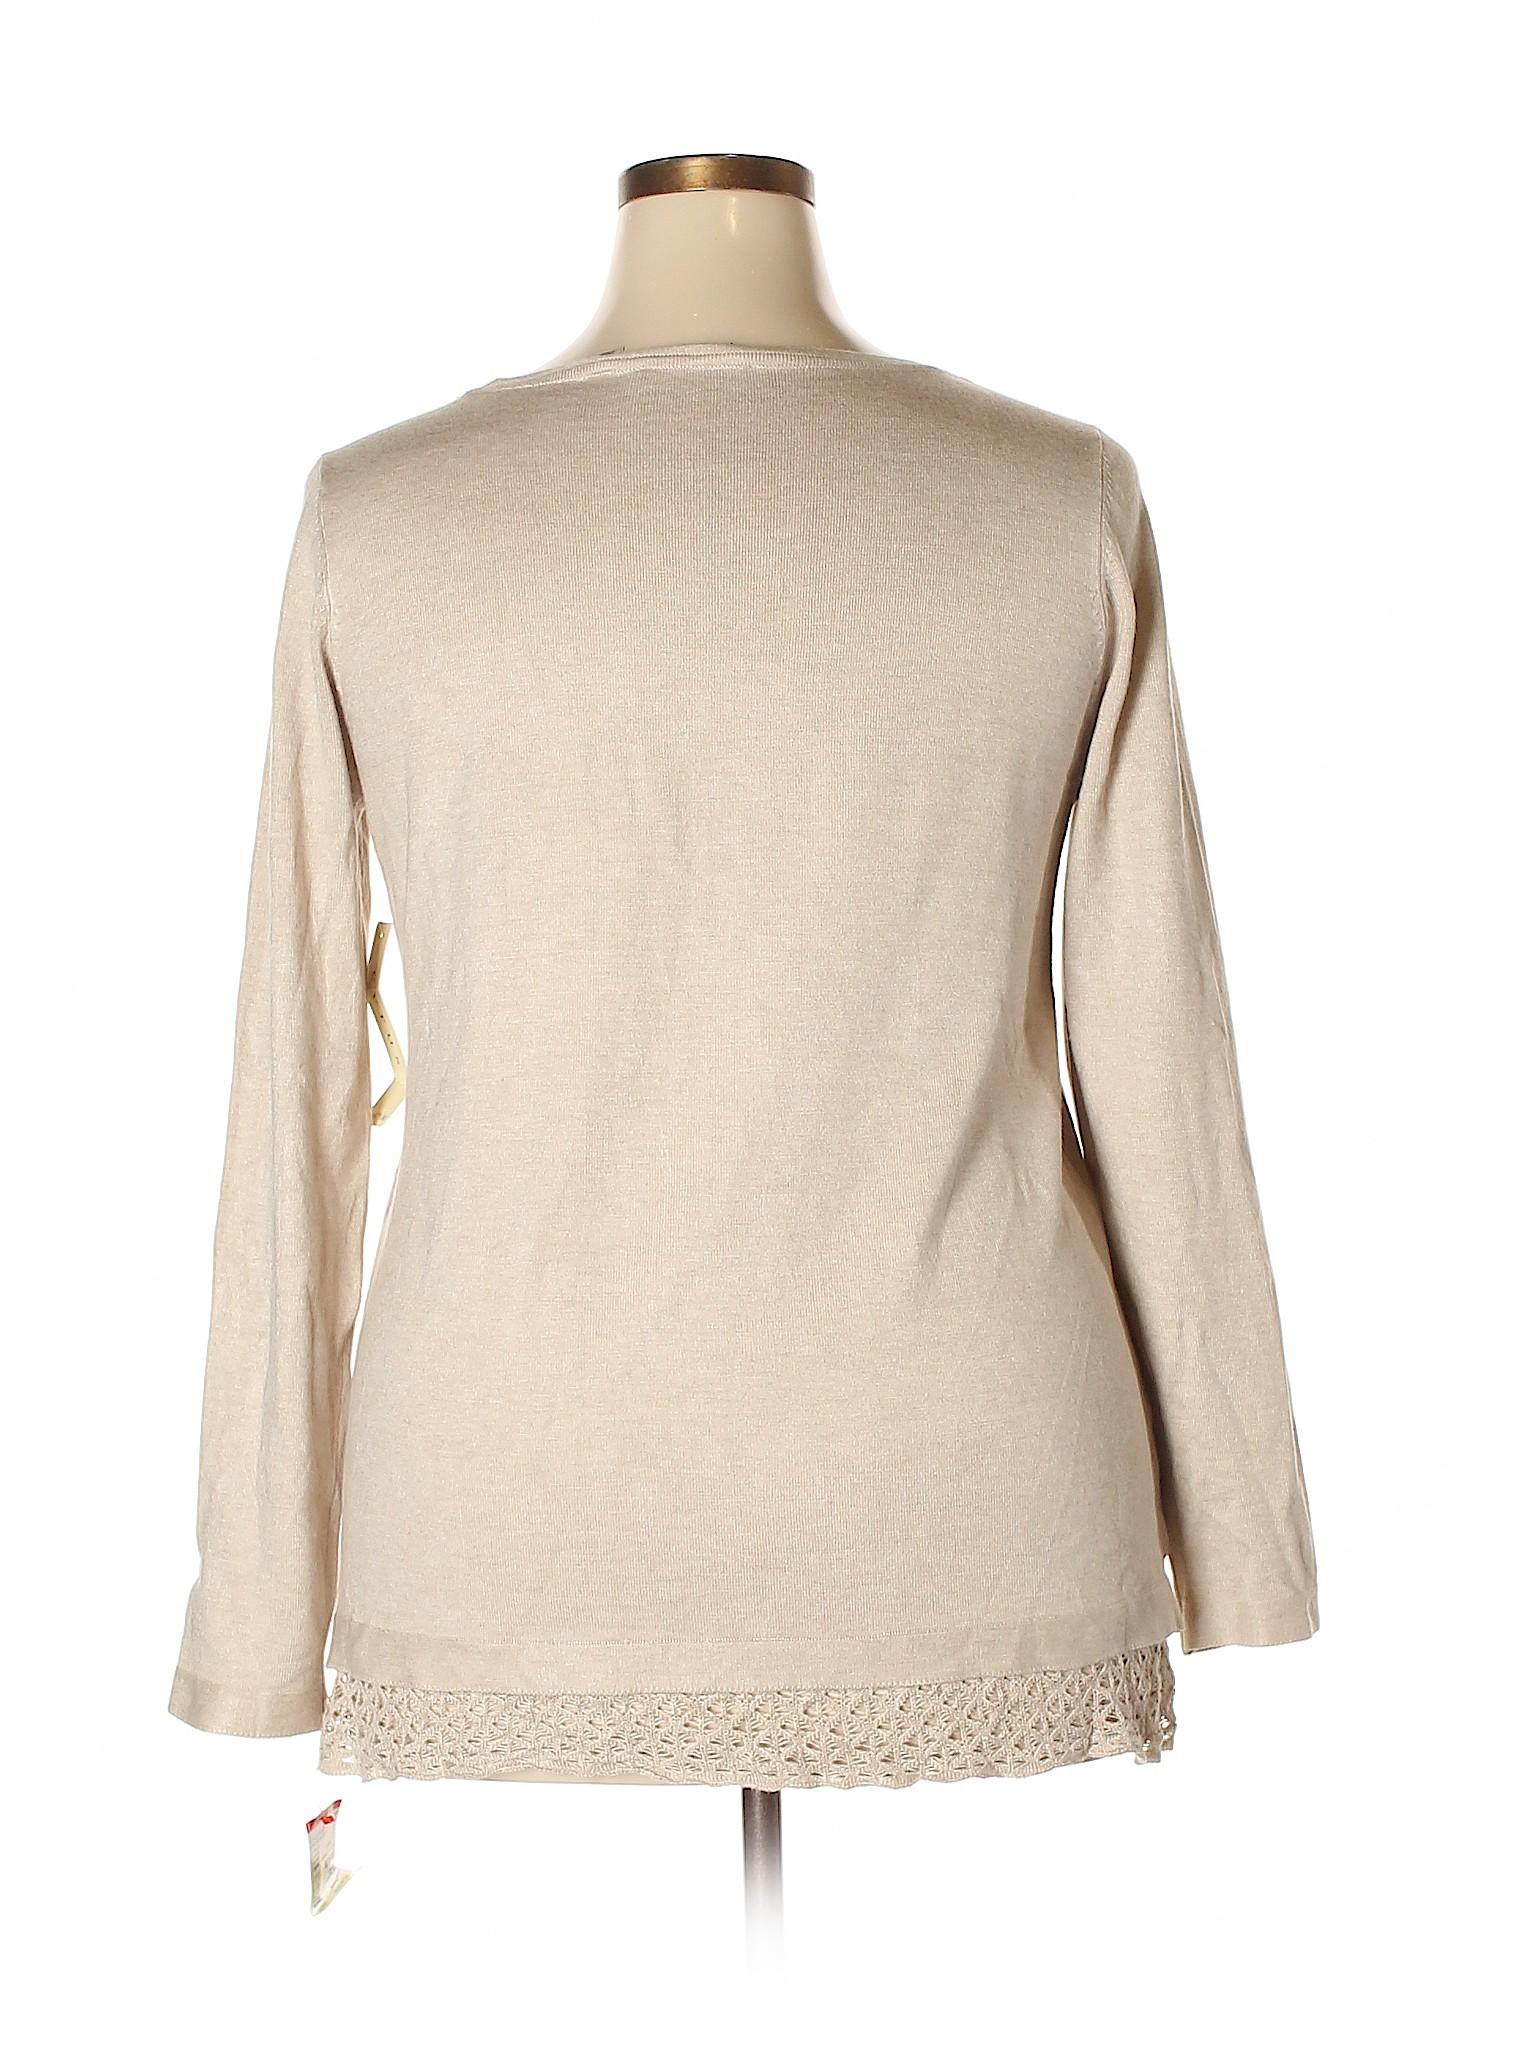 winter Cyrus Boutique Cyrus Pullover Boutique Sweater winter Cyrus winter Sweater winter Pullover Pullover Sweater Boutique Boutique g7wgARz